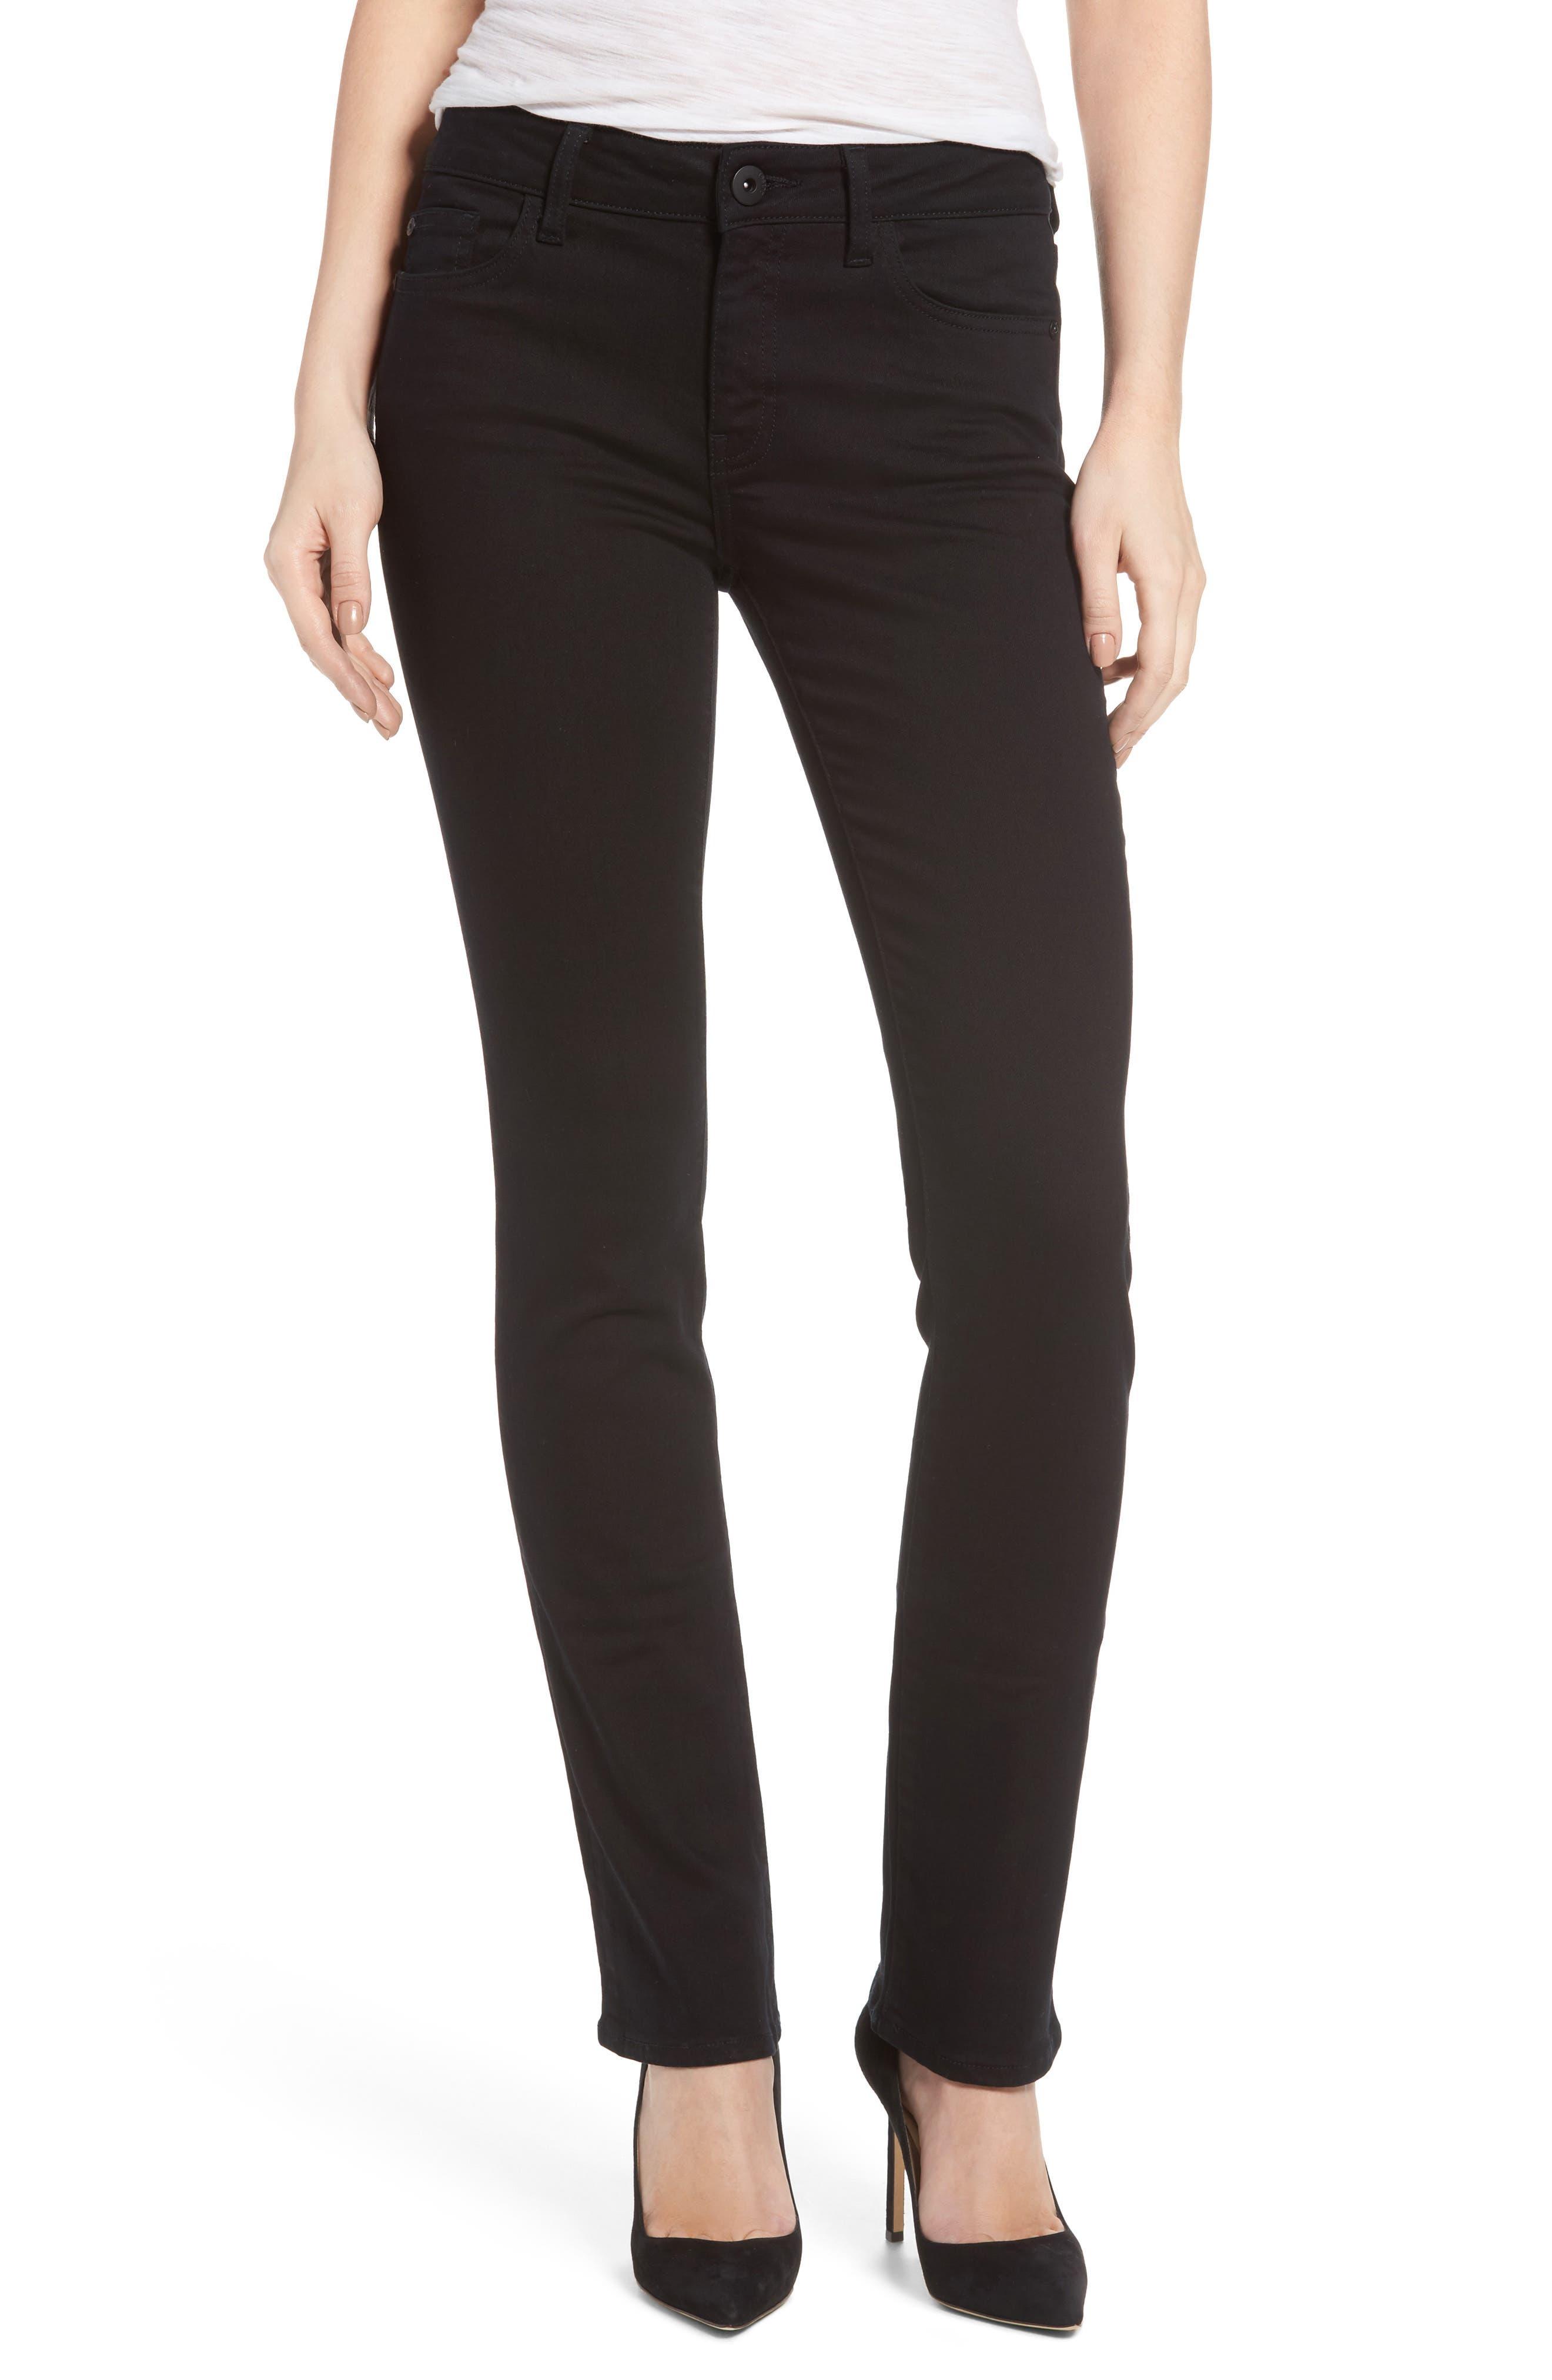 Mara Straight Leg Jeans,                         Main,                         color, Nightwatch